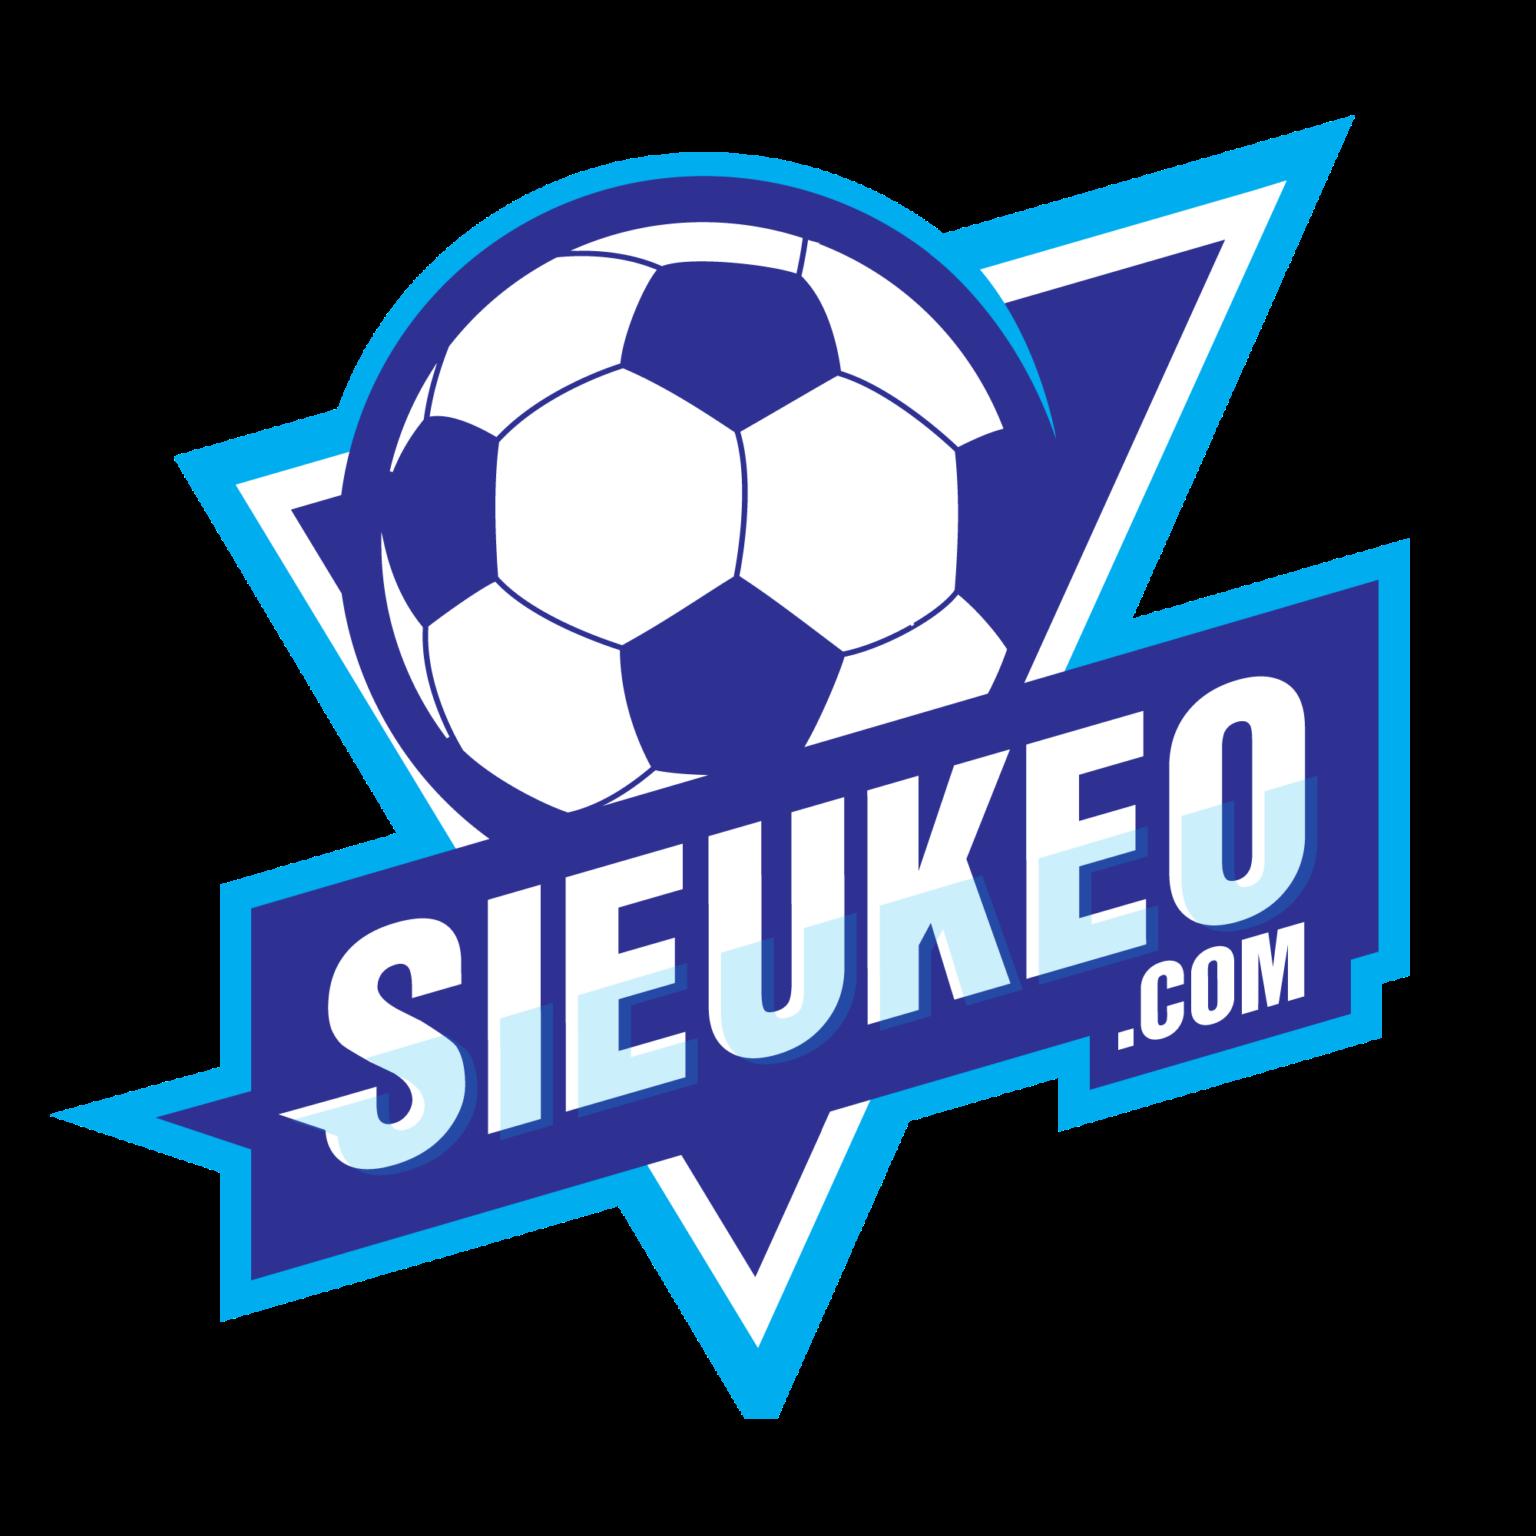 Soi kèo Everton và Bournemouth cực hấp dẫn tại Sieukeo.com